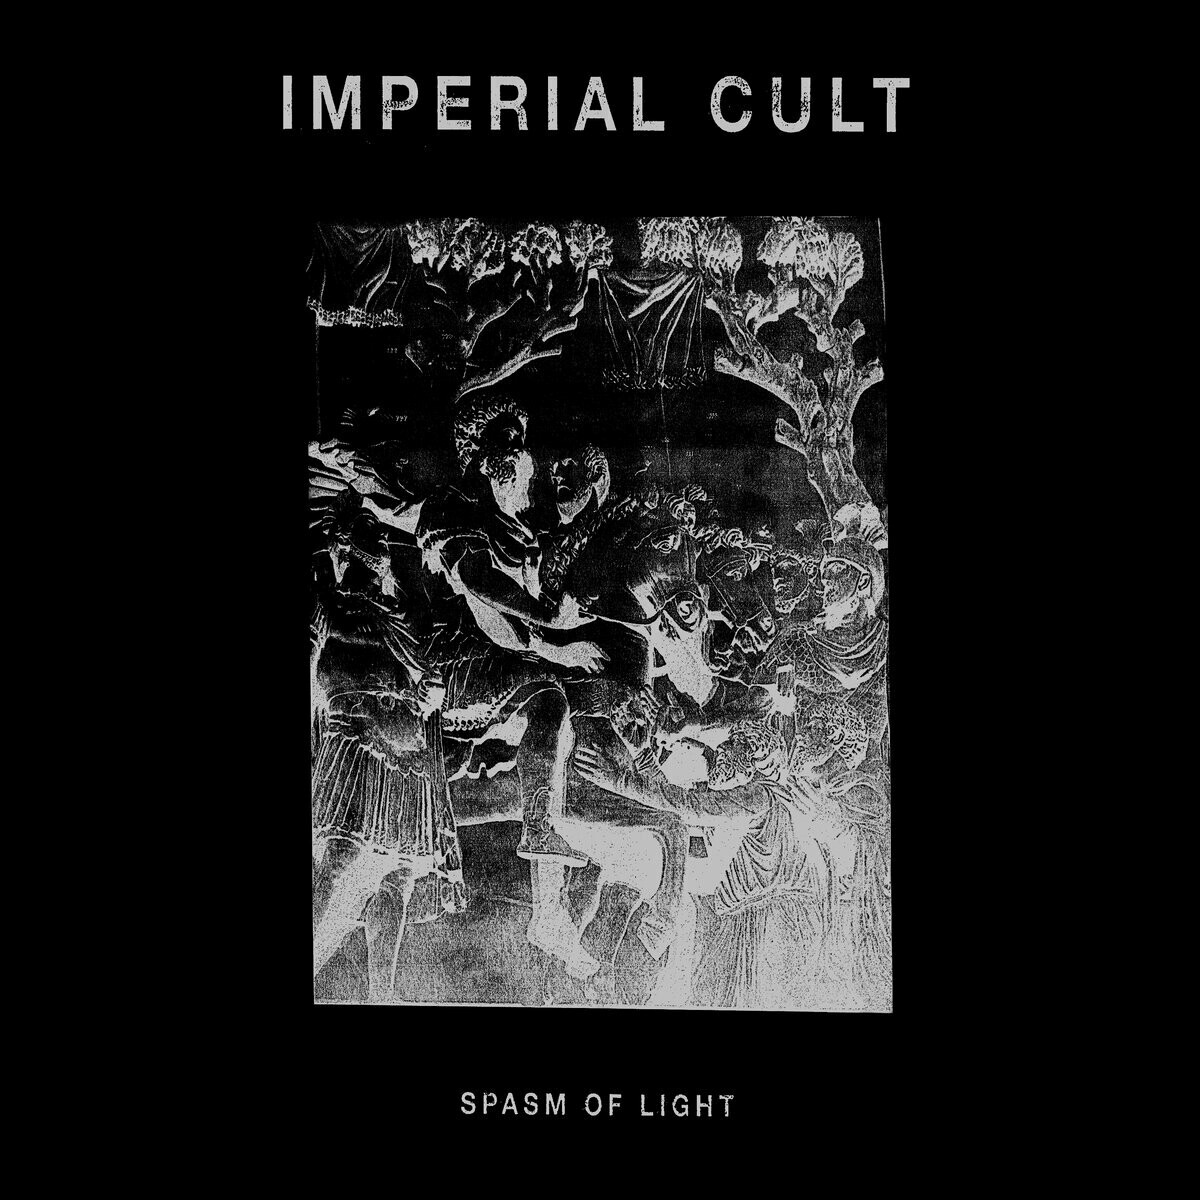 Imperial Cult - Spasm of Light